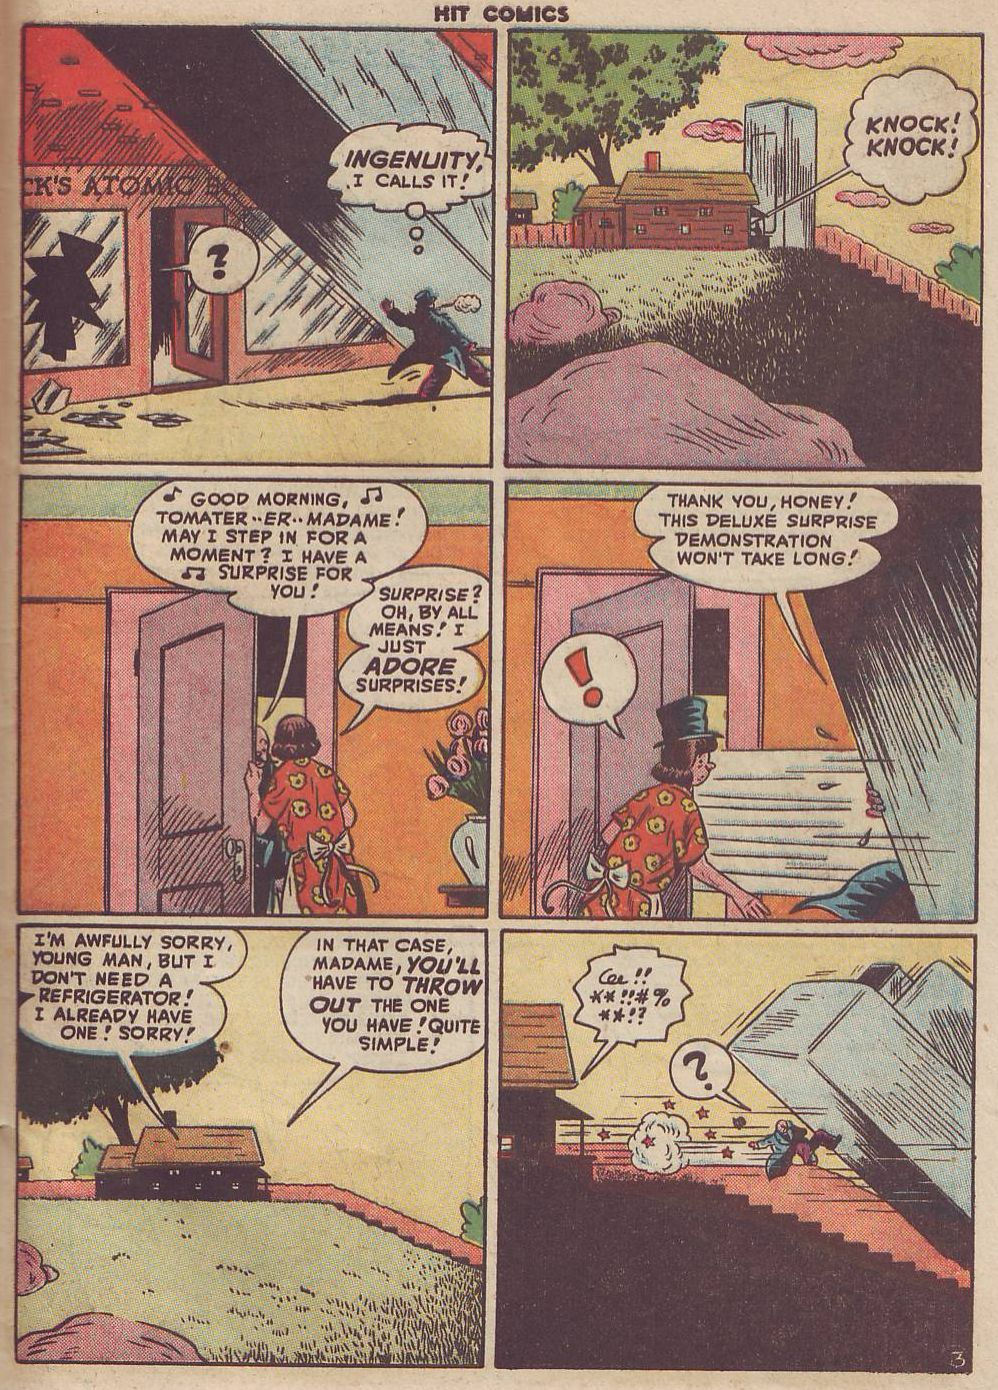 Read online Hit Comics comic -  Issue #51 - 41